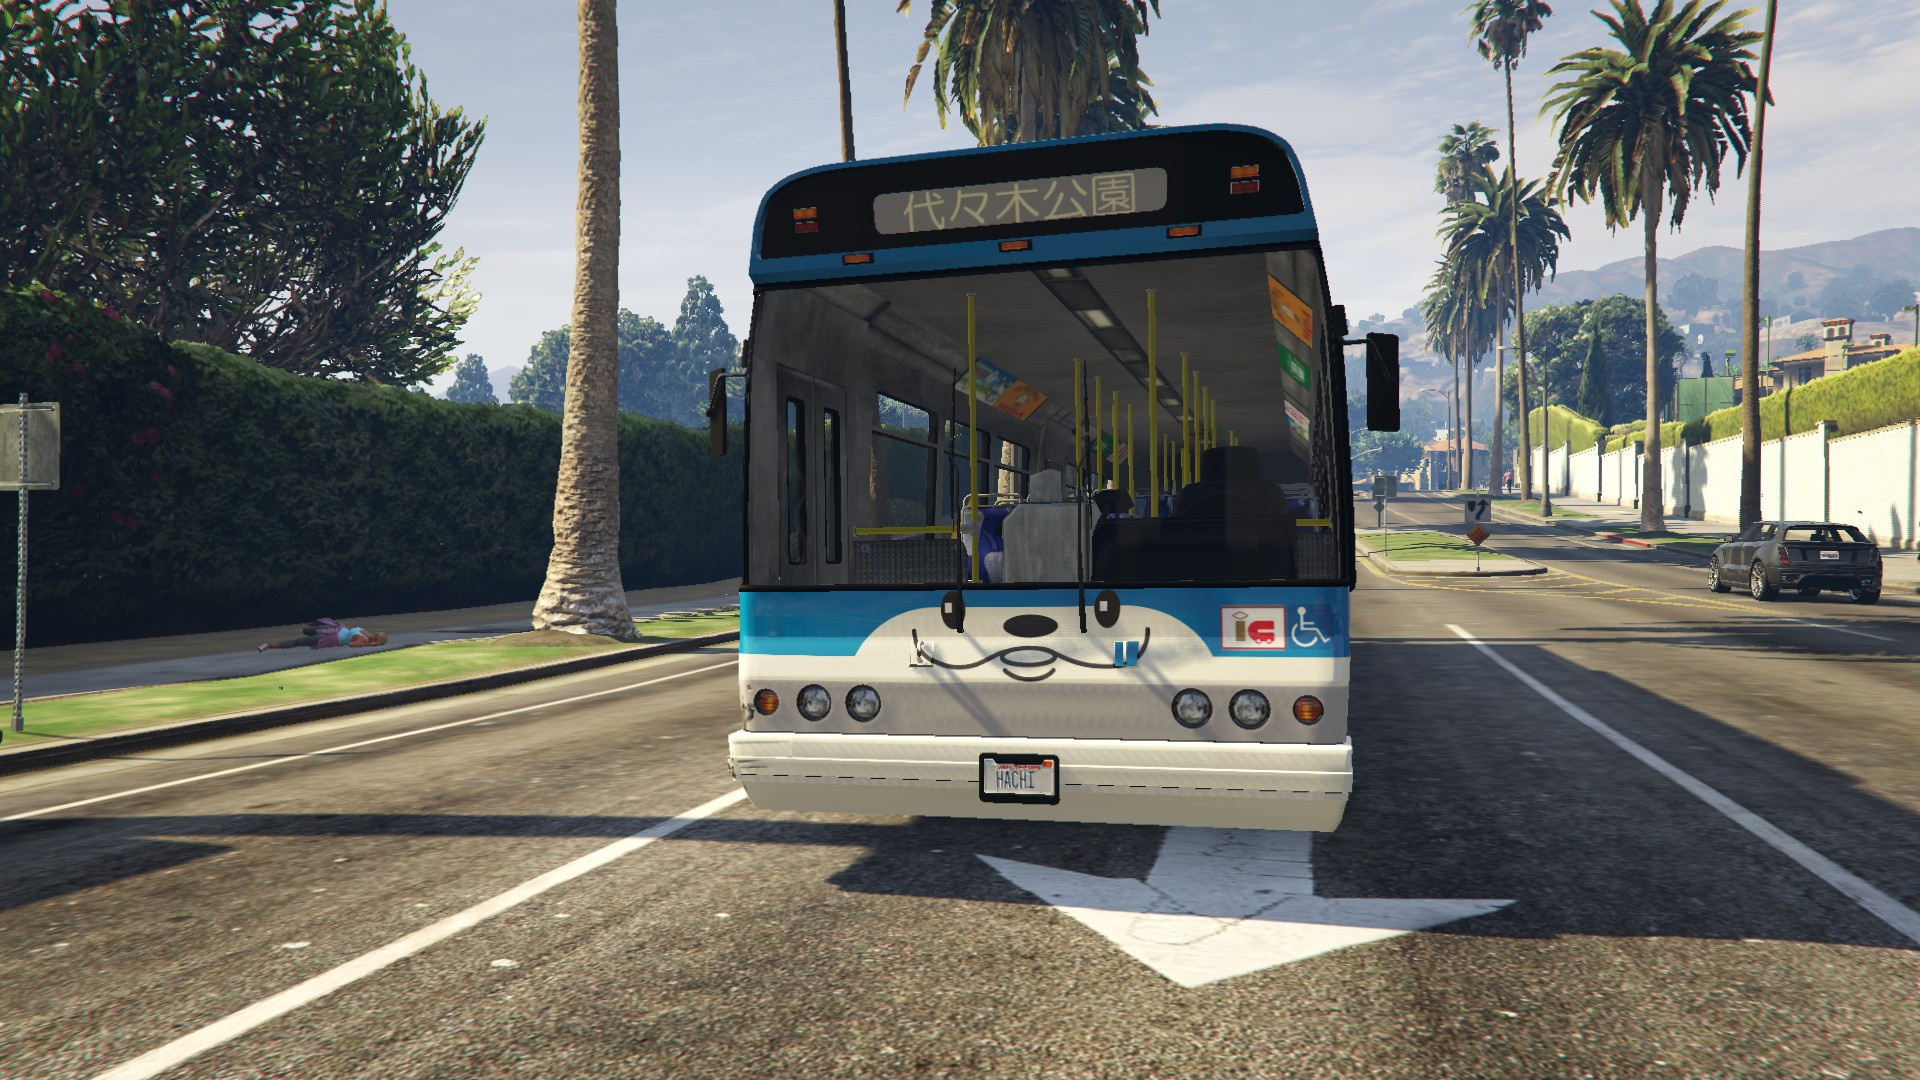 Shibuya Hachiko Bus Skin - GTA5-Mods com